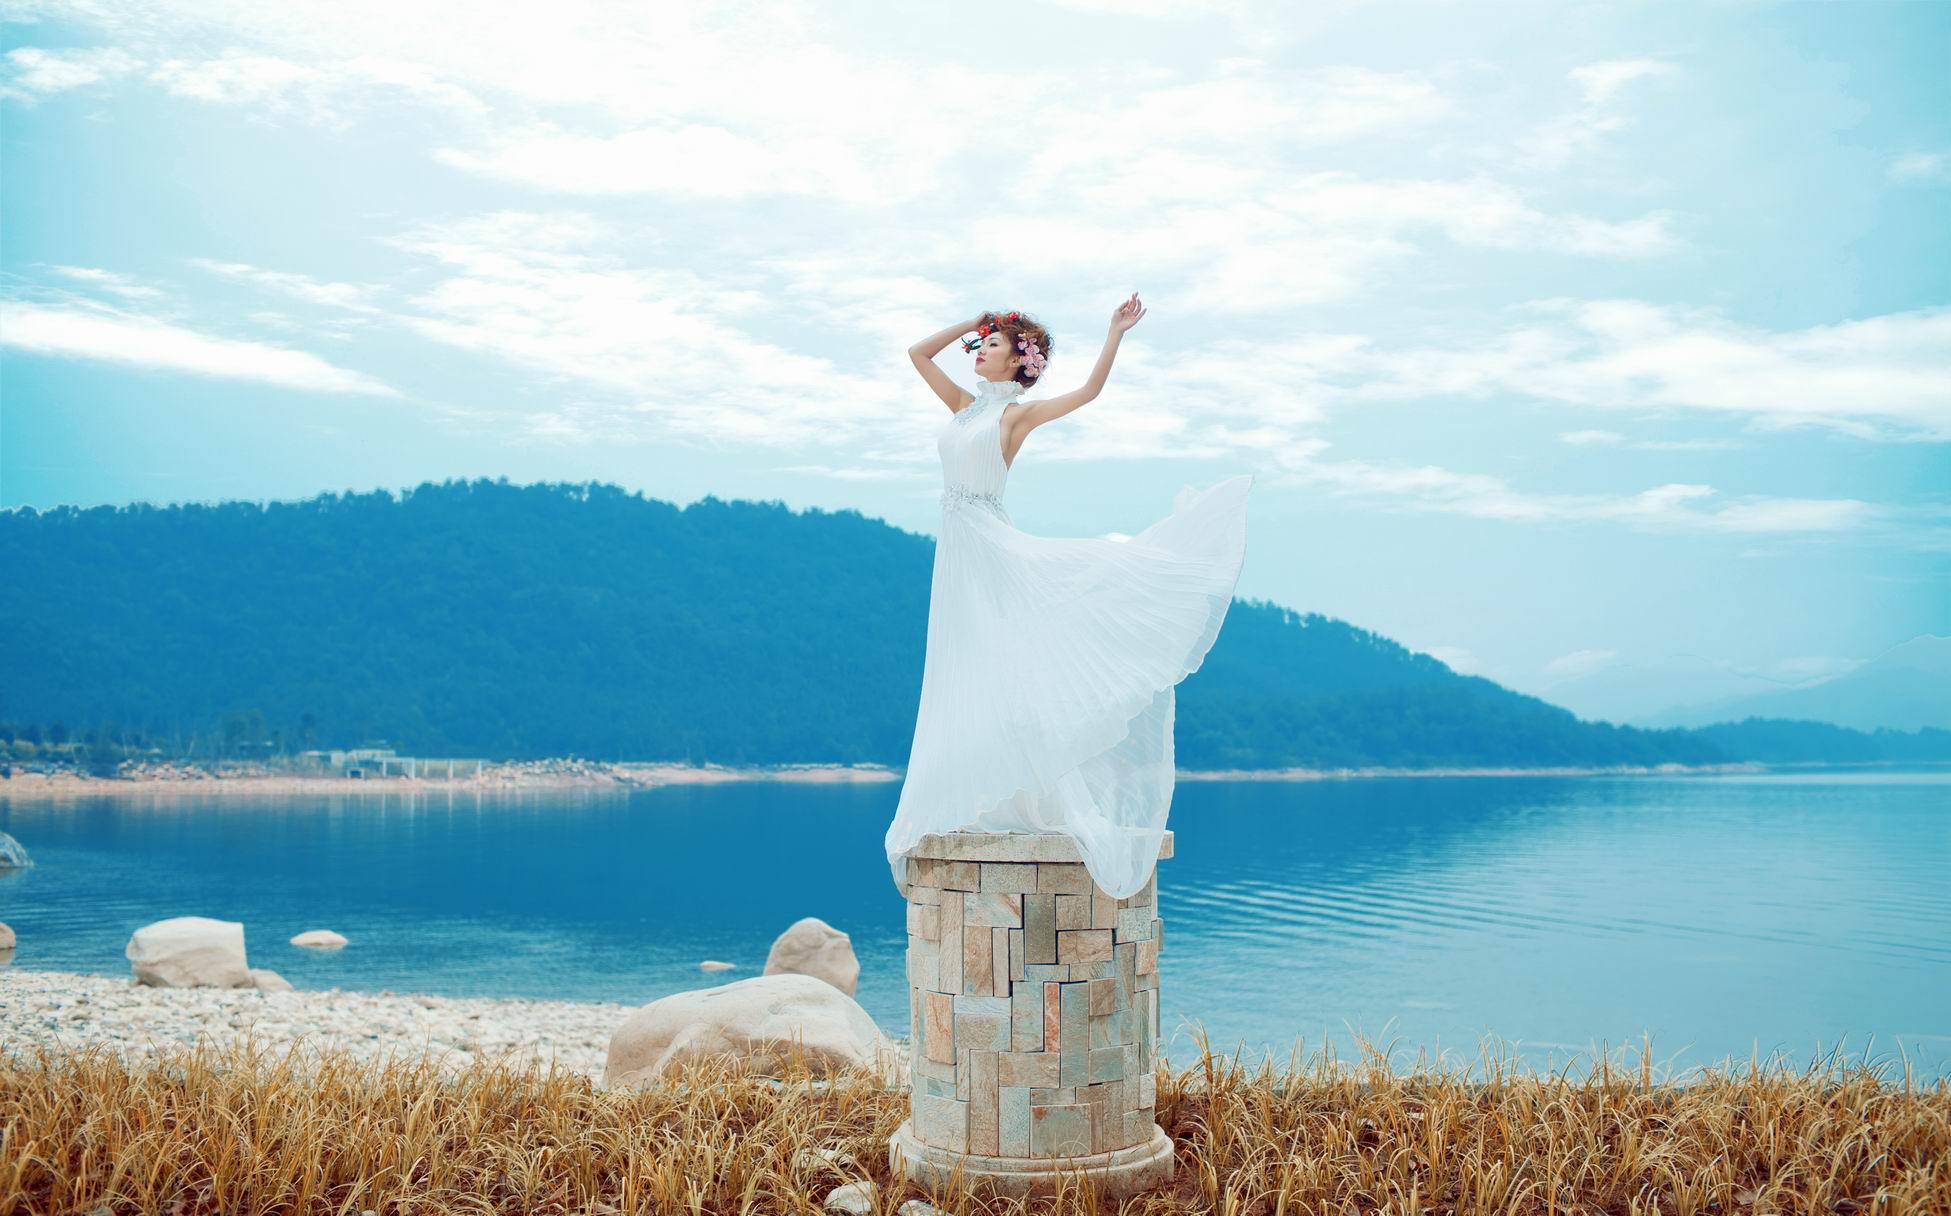 千鳥湖婚紗攝影_千鳥湖婚紗攝影_千鳥湖婚紗攝影圖片